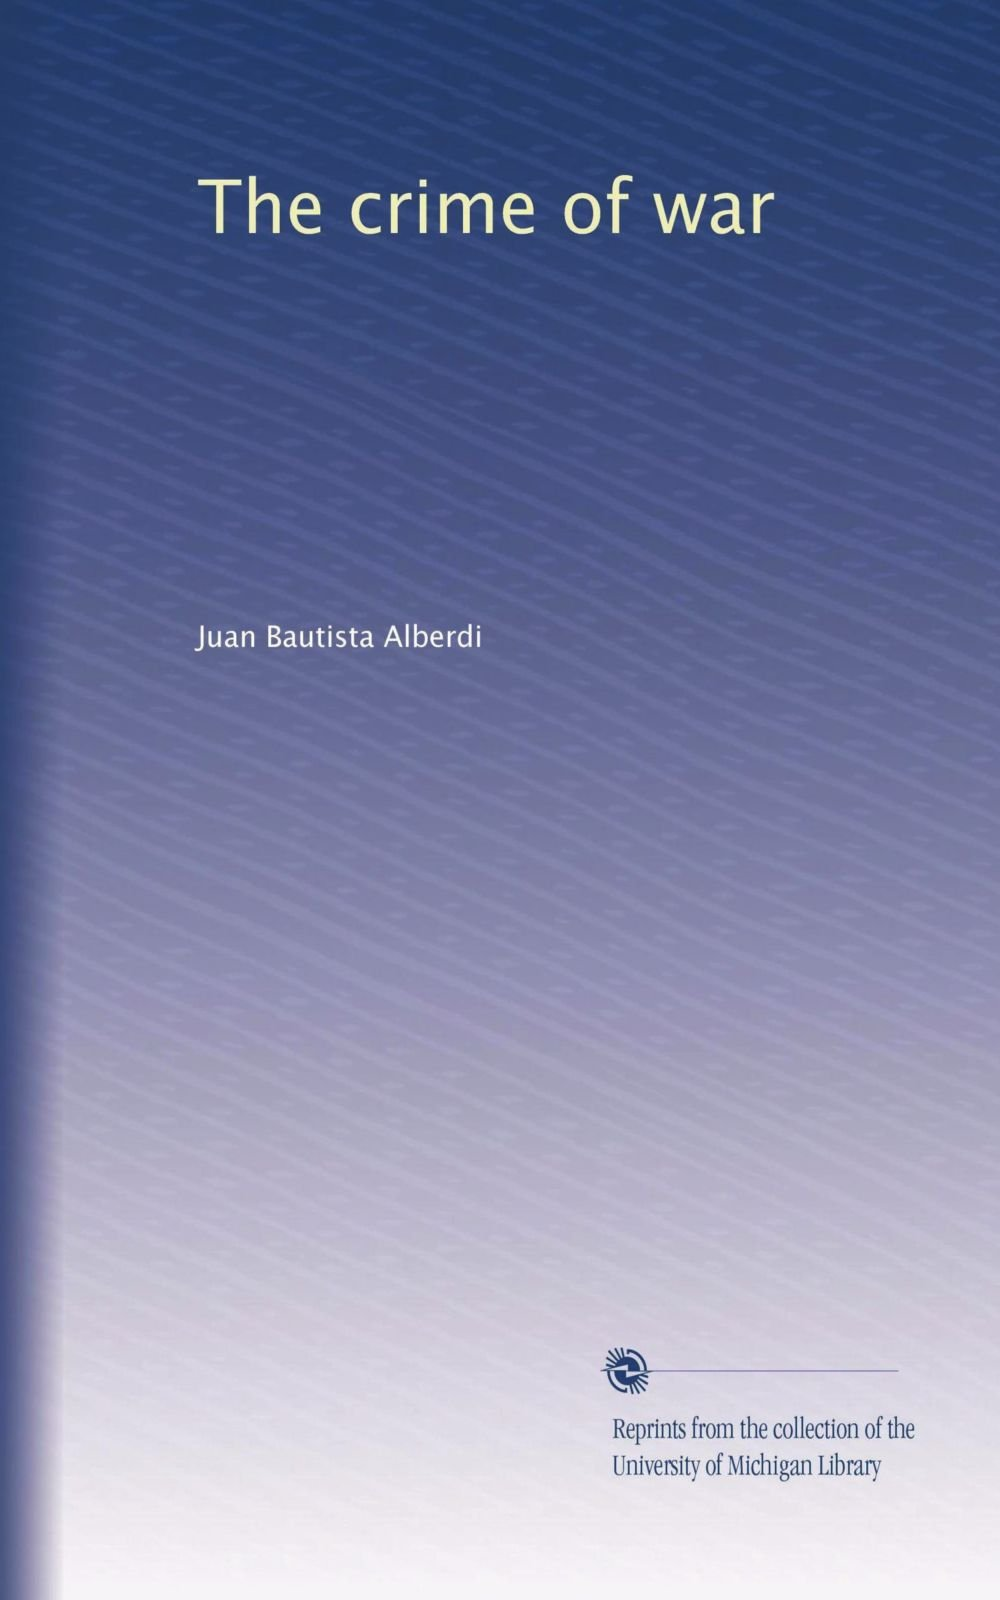 The crime of war: Juan Bautista Alberdi: Amazon com: Books